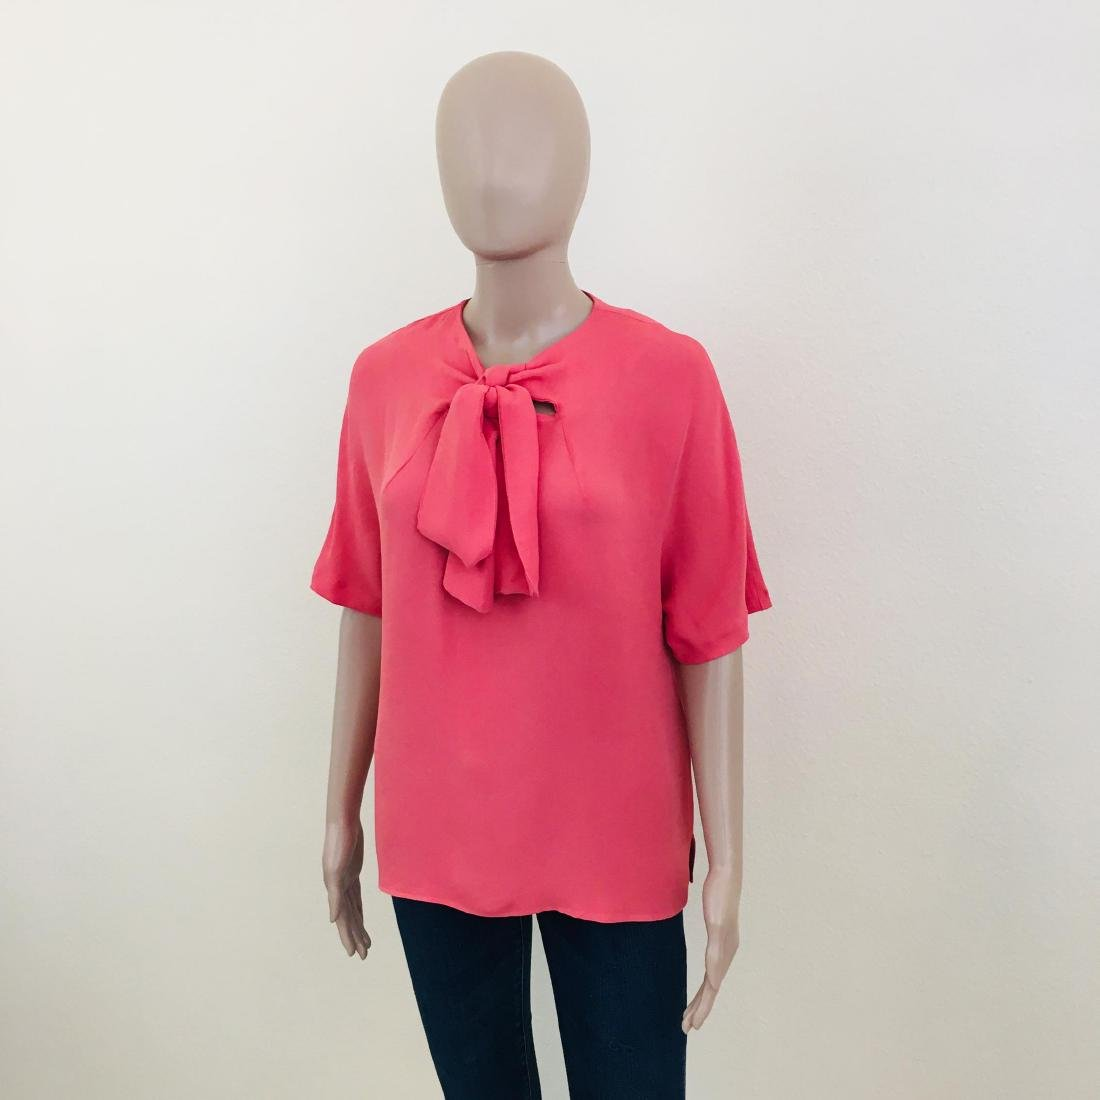 New Women's ZARA Top Blouse Size M - 3